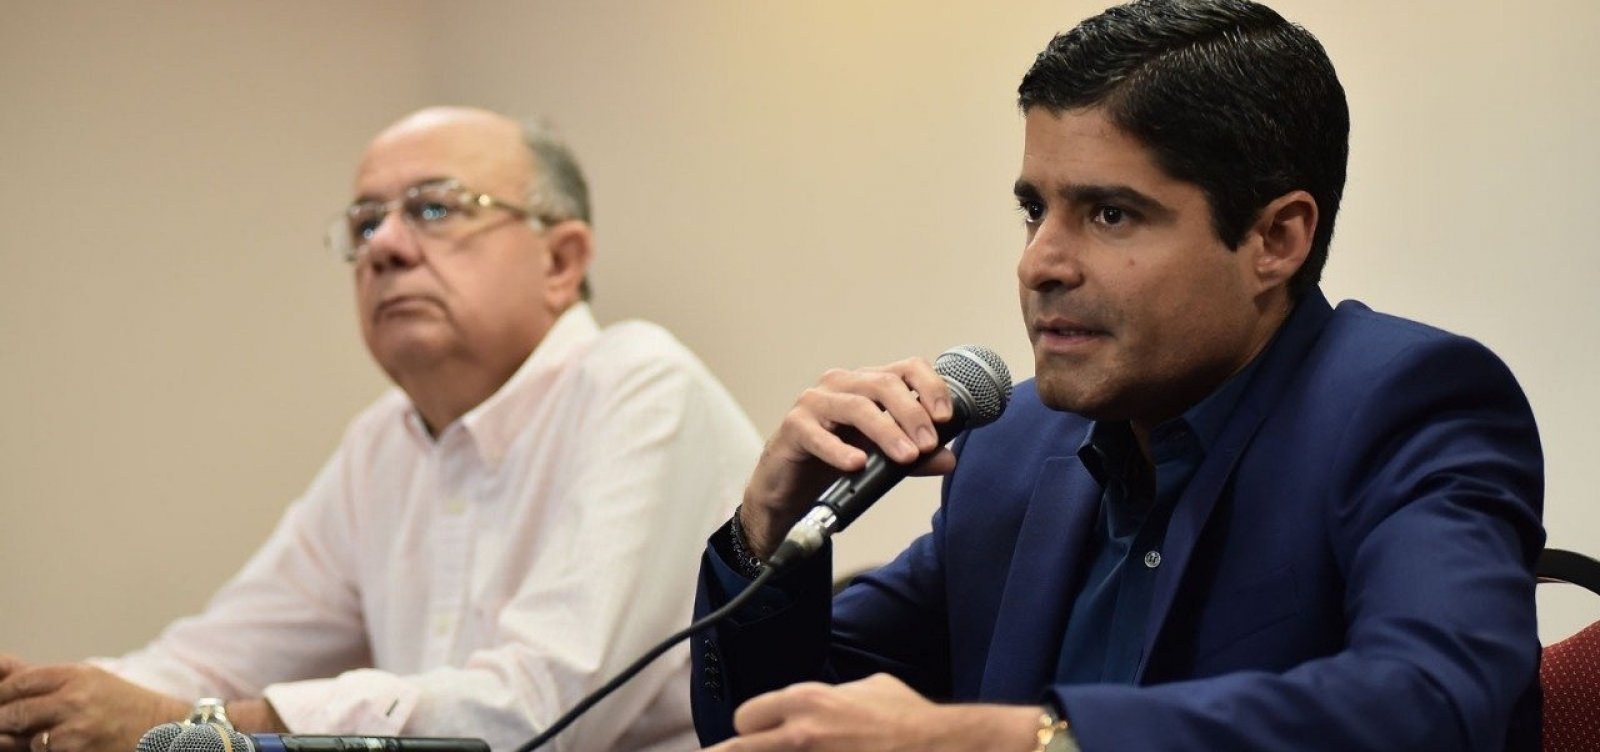 ACM Neto declara apoio a Jair Bolsonaro